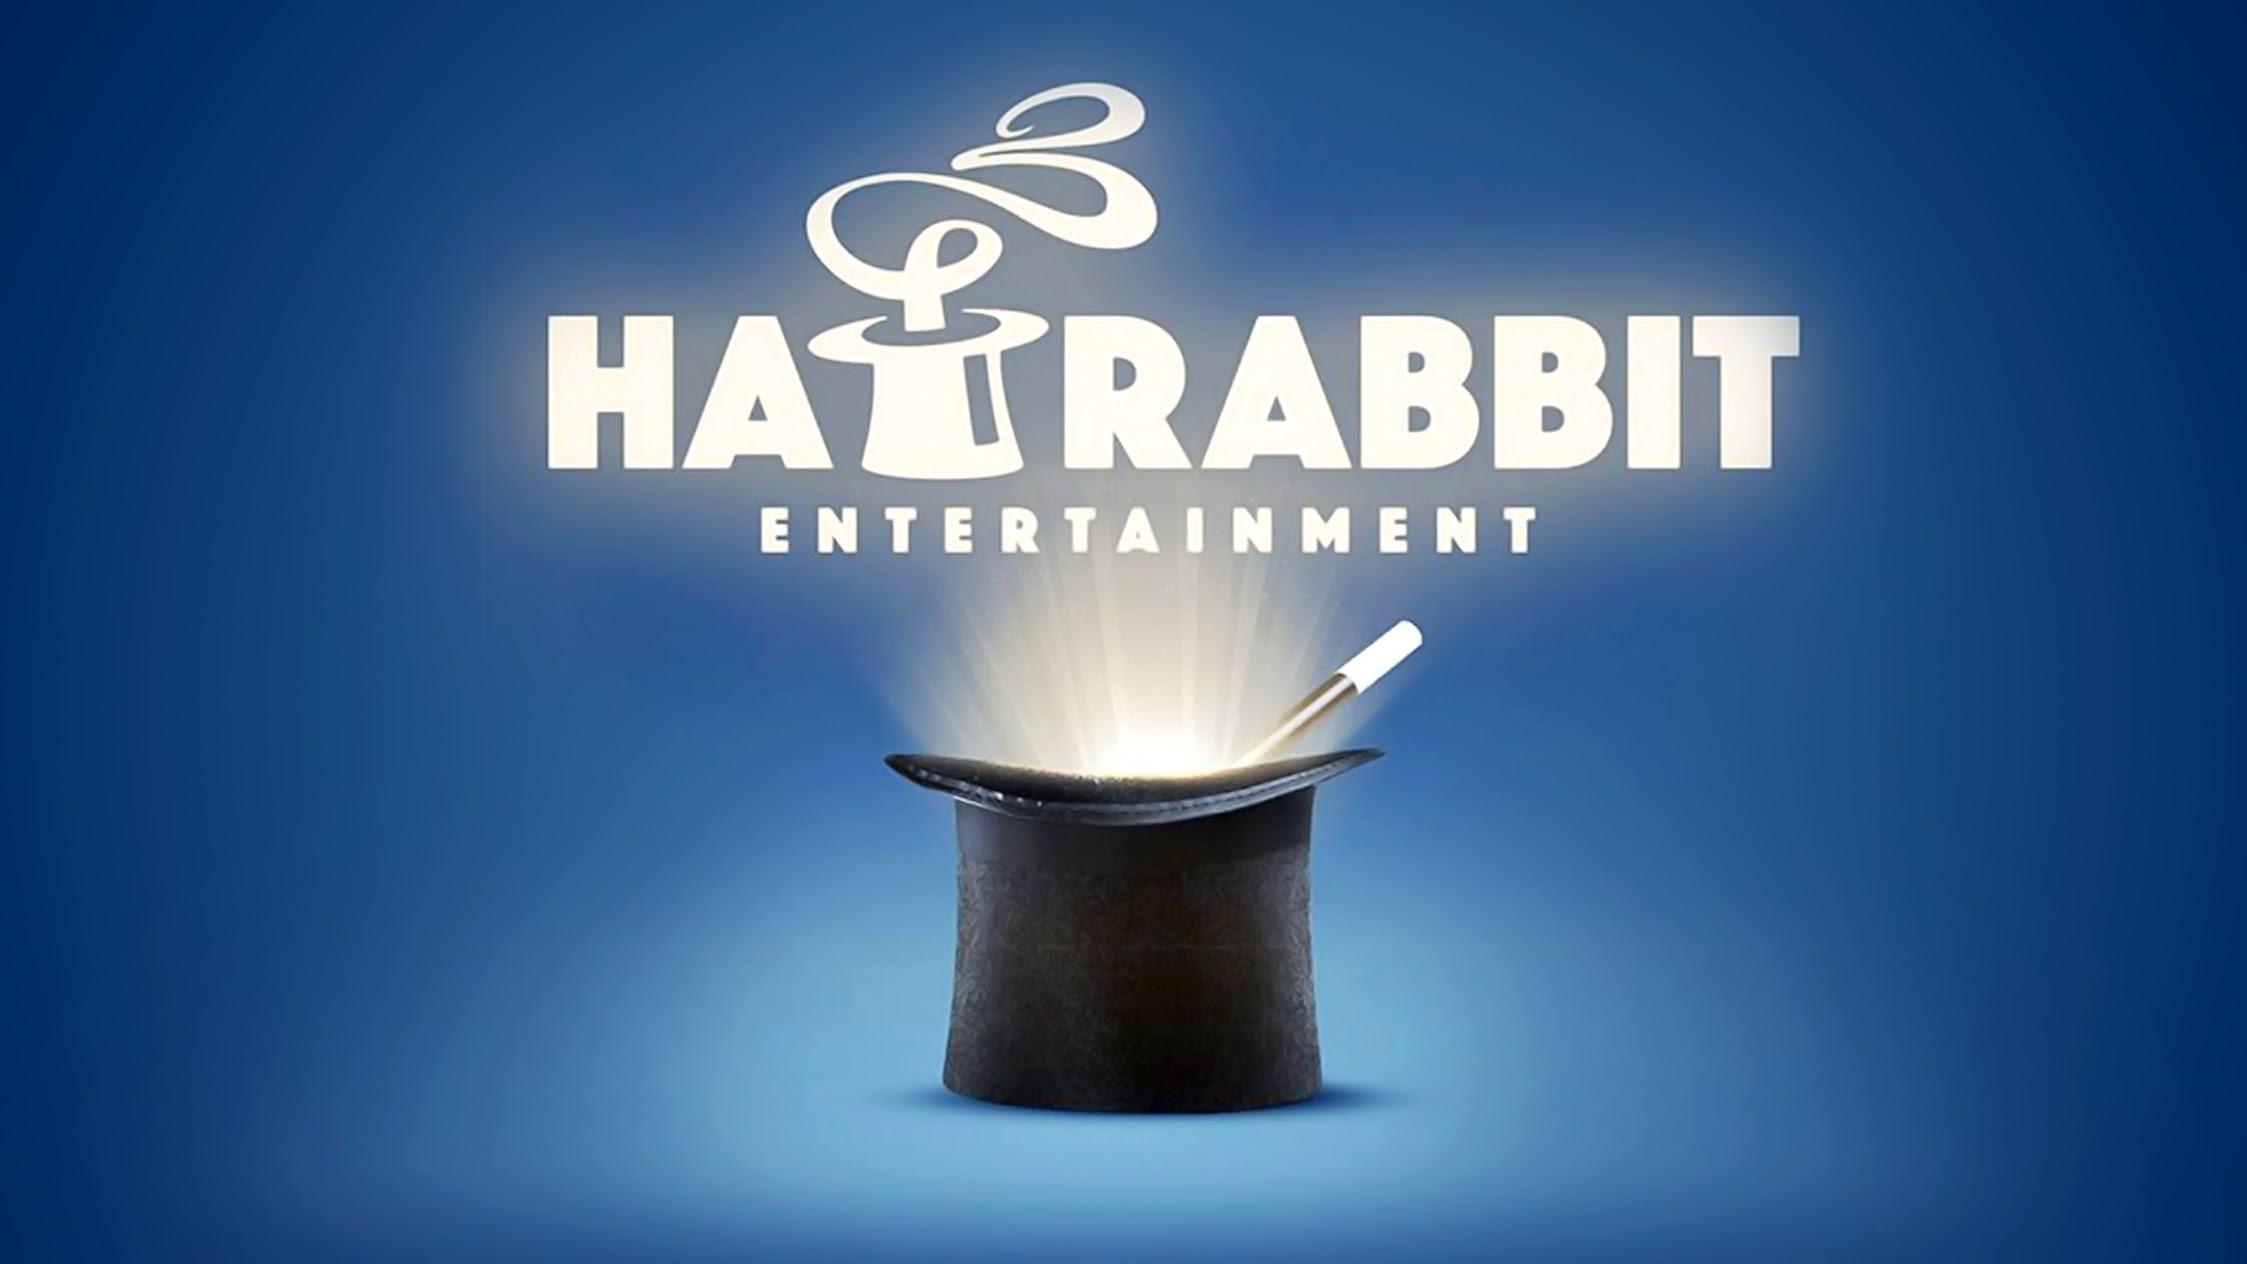 Hatrabbit